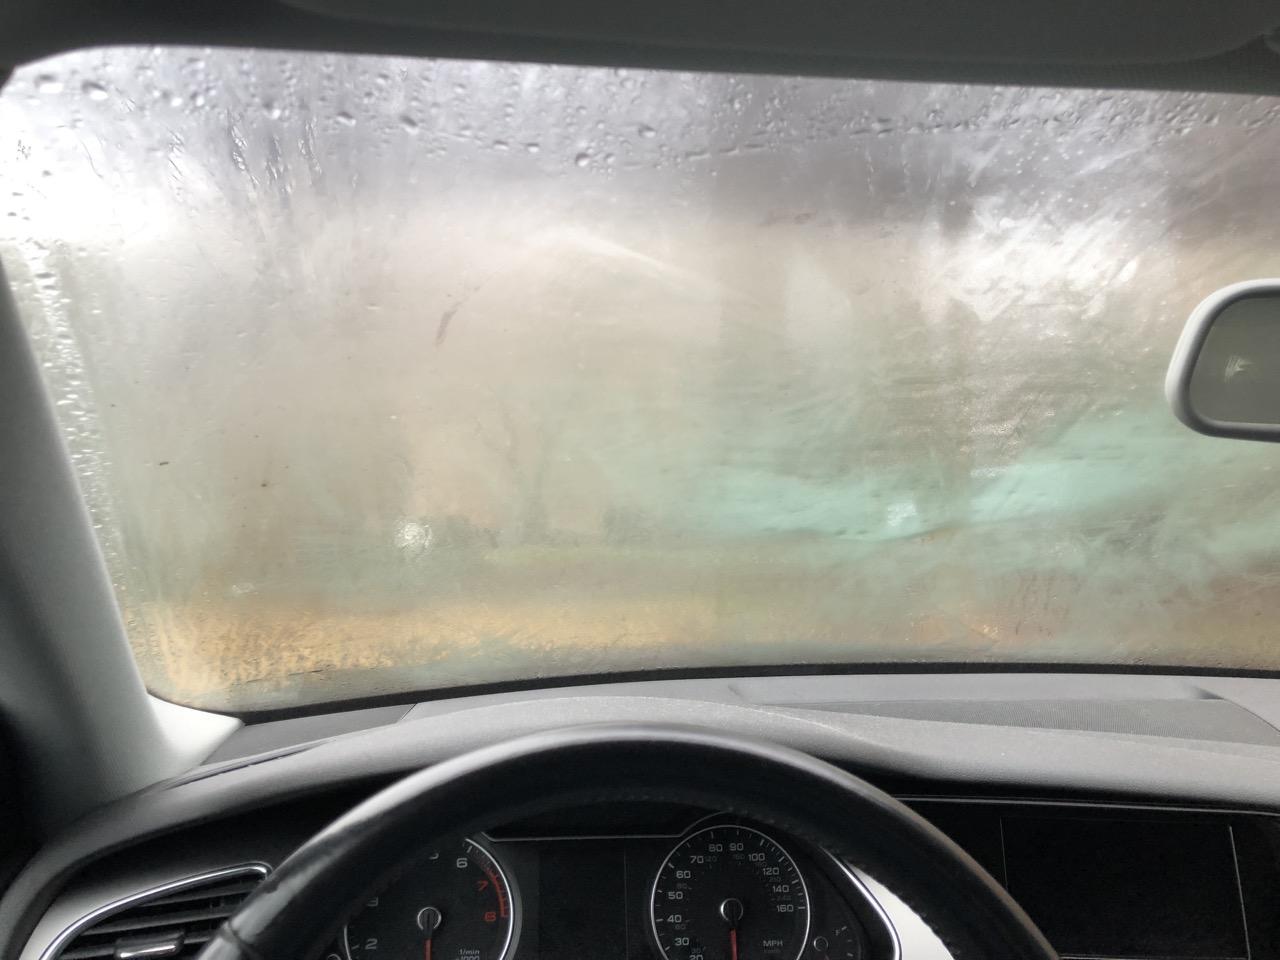 defogging your car windshield with psychrometrics | energy